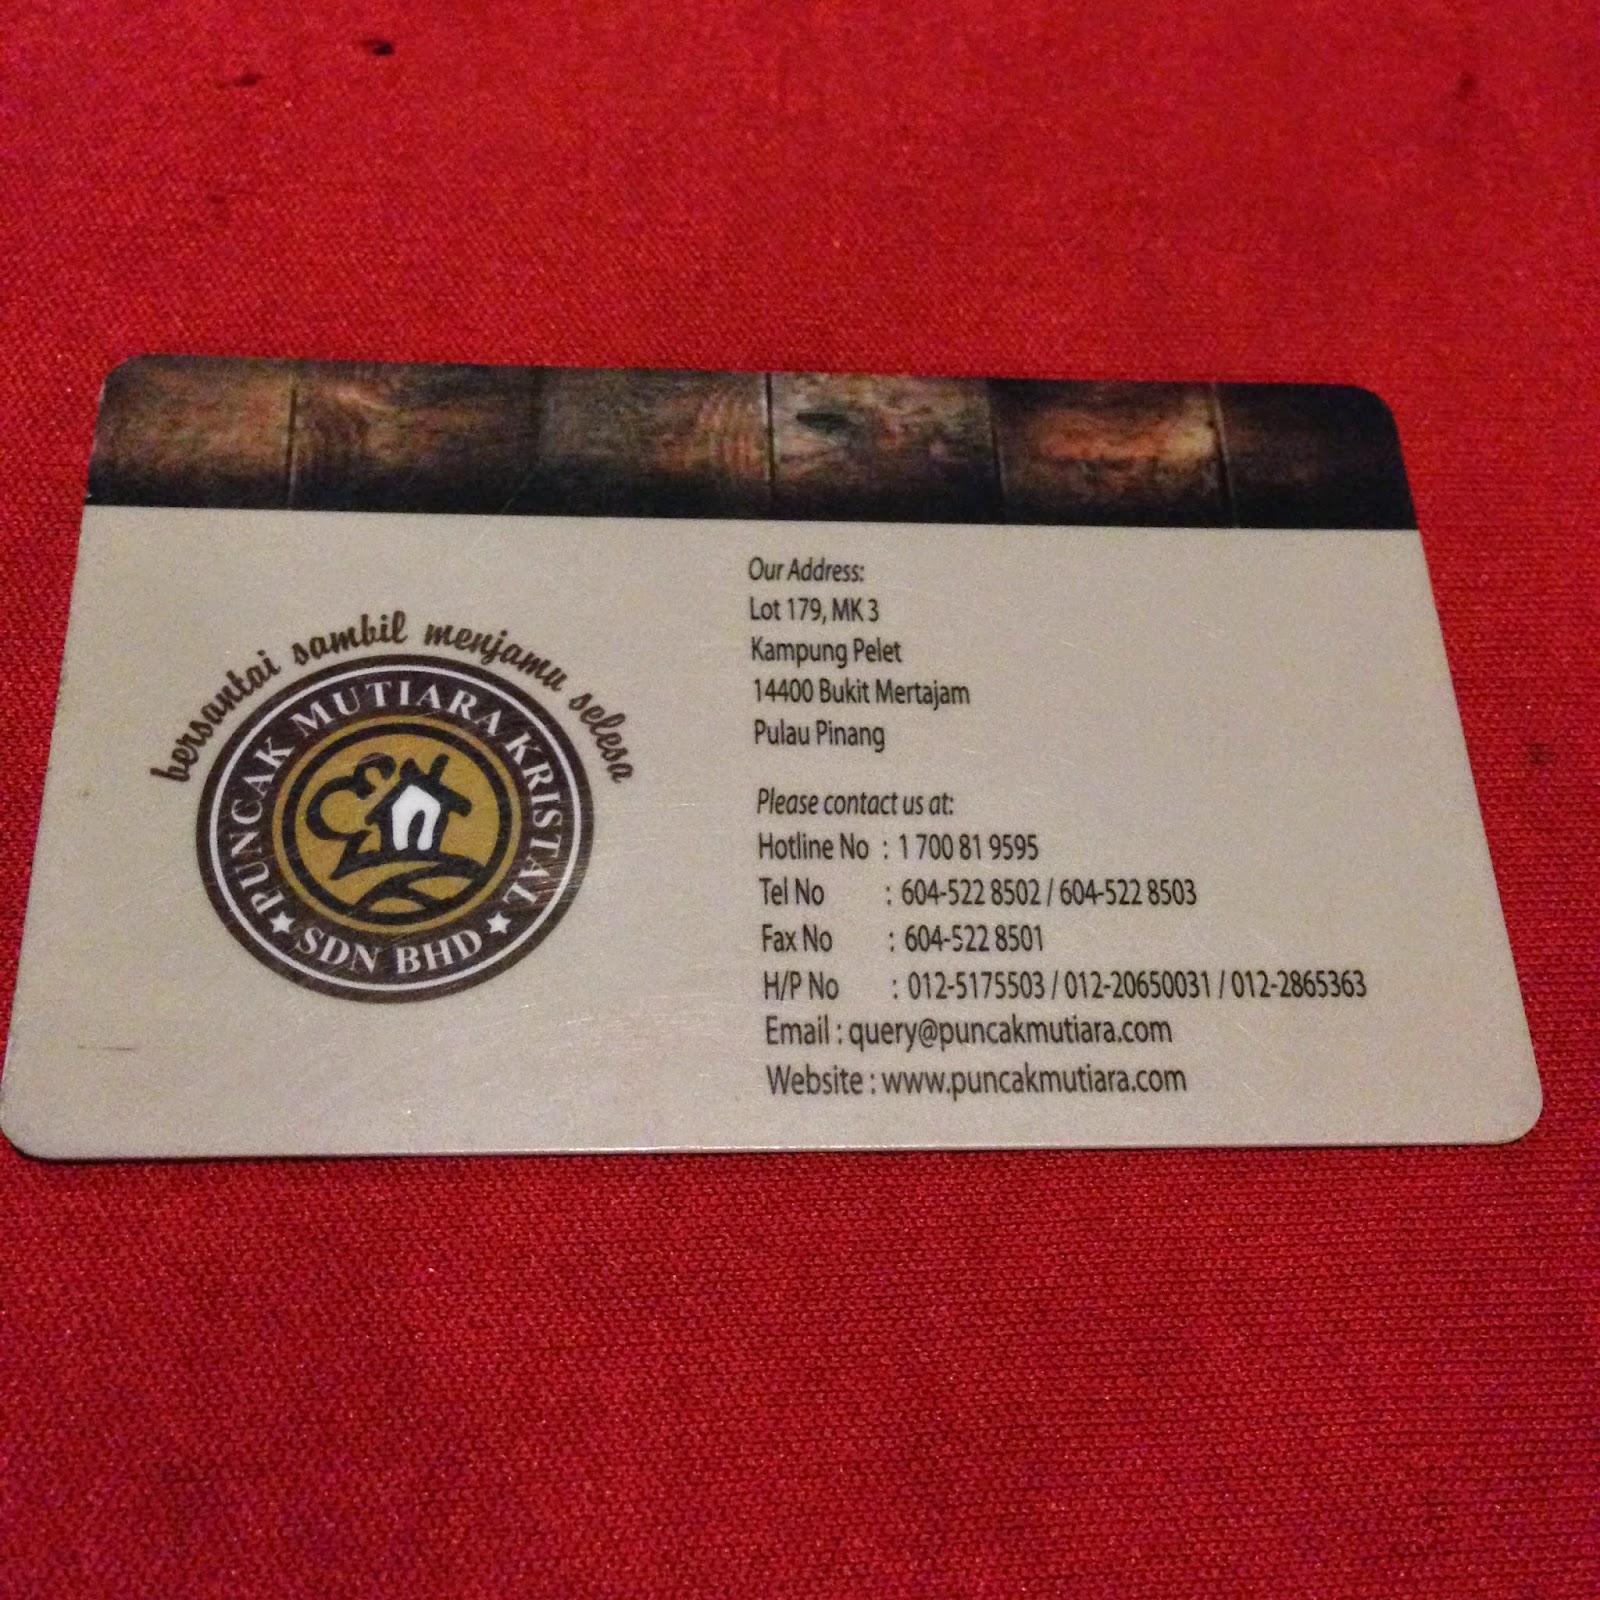 Puncak Mutiara Cafe card